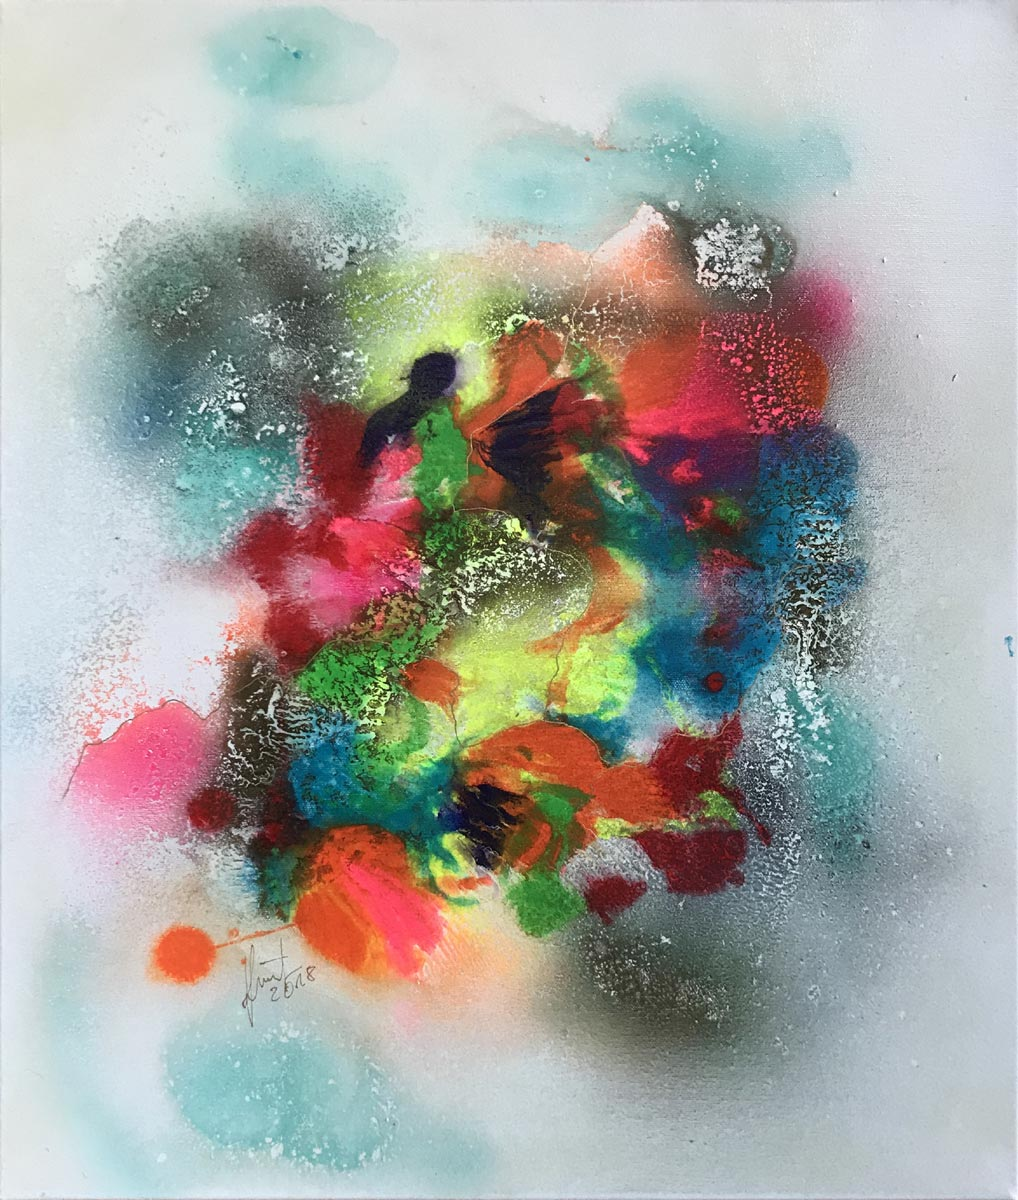 "Werk von Gisela Grünling - Titel ""Farbspektakel 20"" - Technik: Aquarell, Airbrush, Lack-Technik"